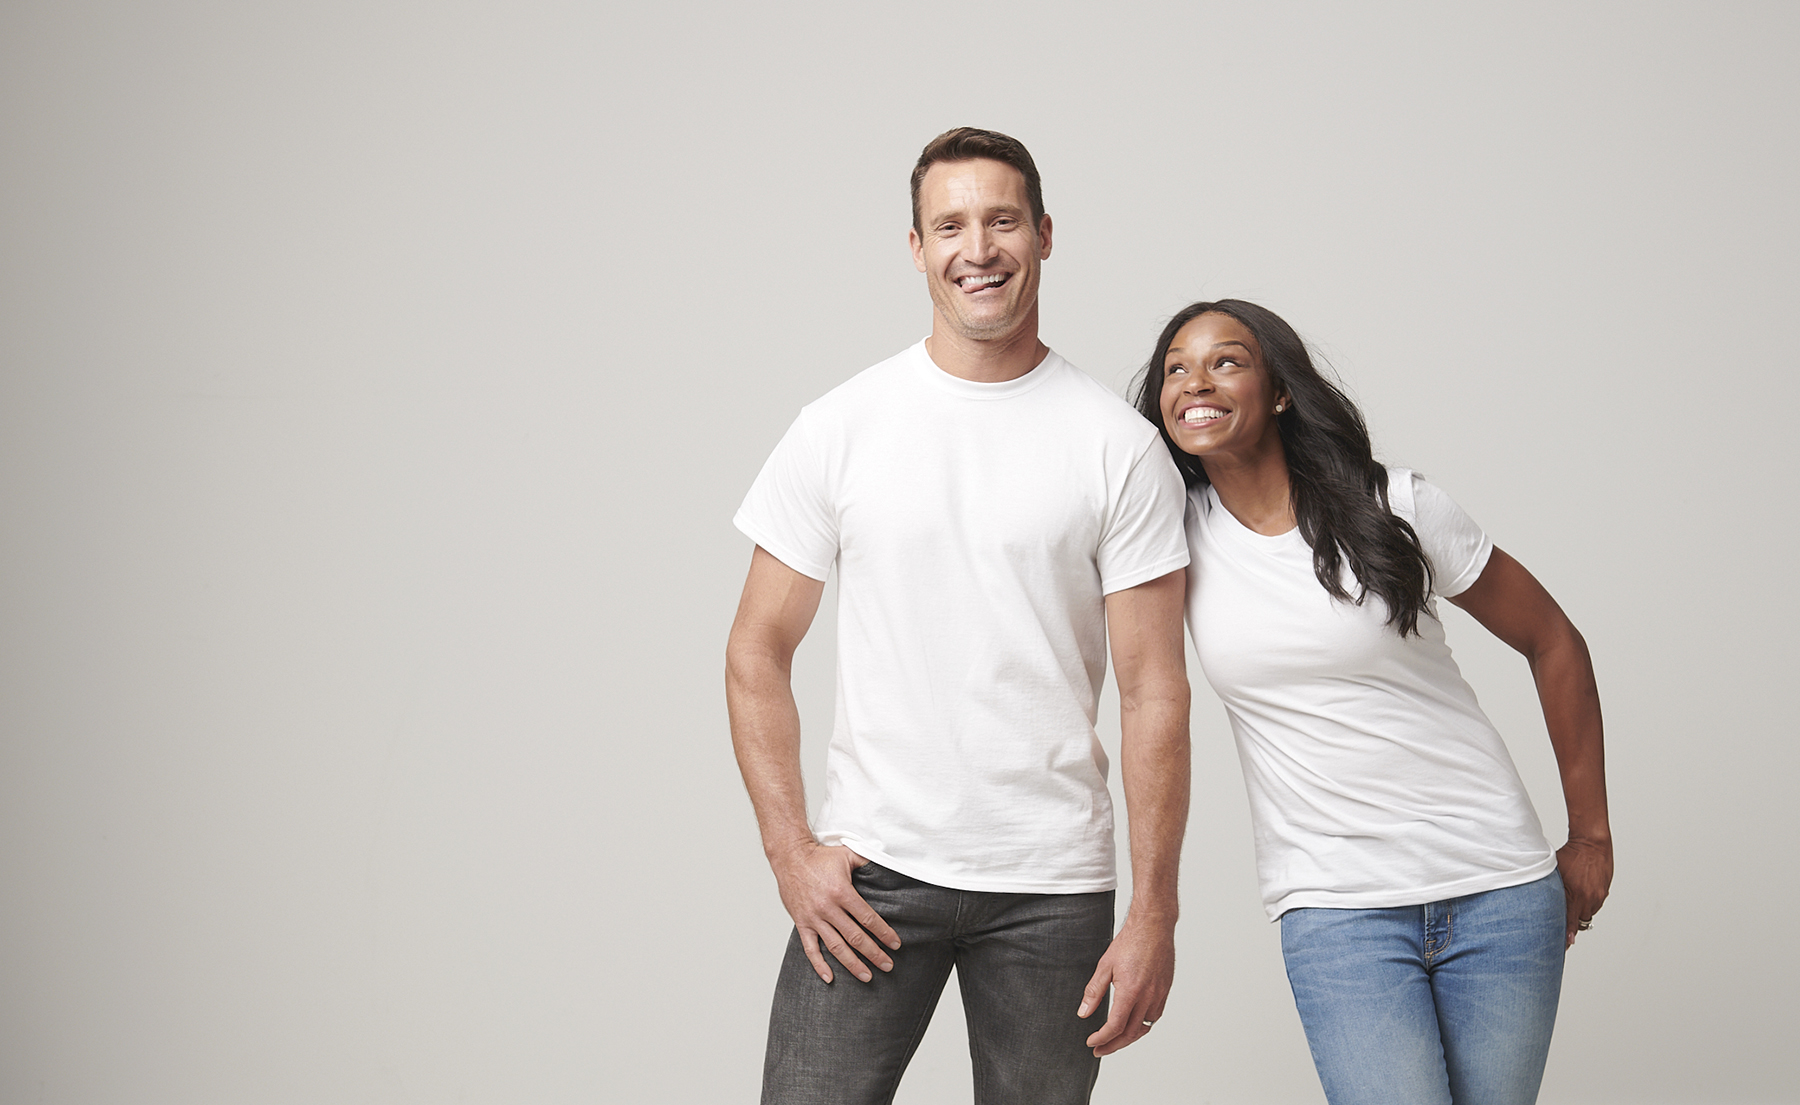 Basic_Shirt_White_Grouping_Regina_Simon_White_Wall_0731_WEB.jpg